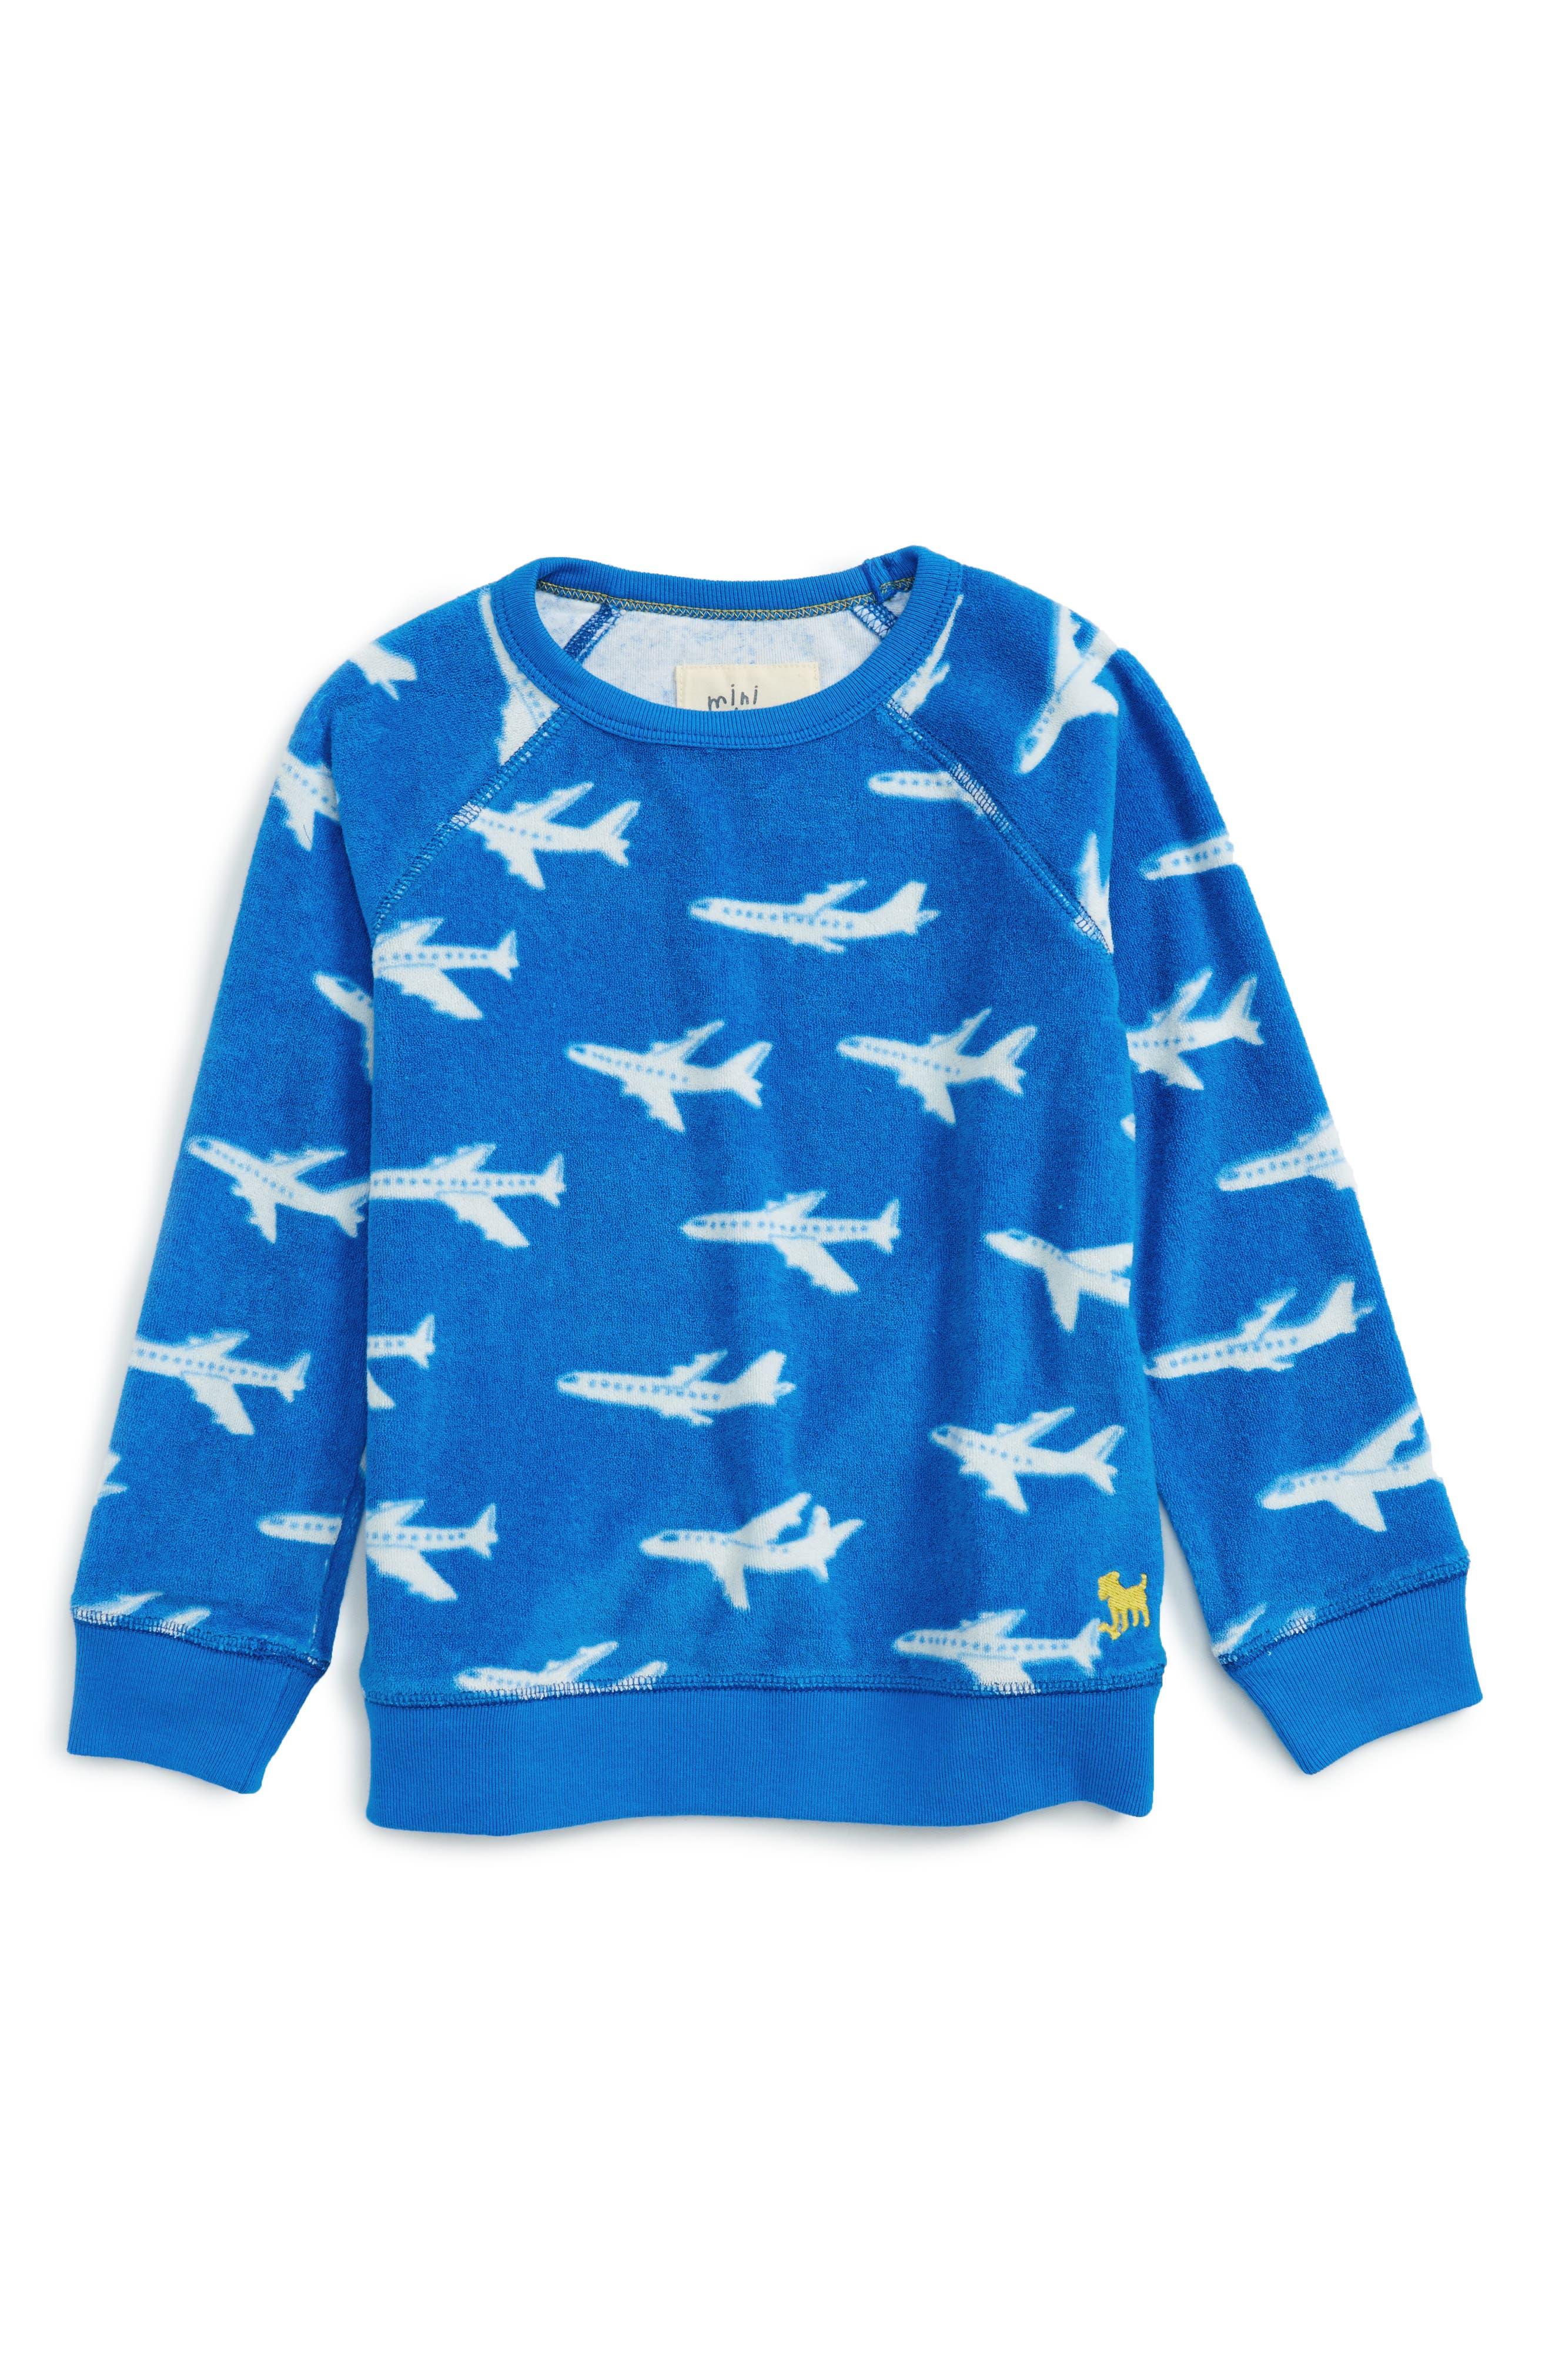 Main Image - Mini Boden Towelling Sweatshirt (Toddler Boys, Little Boys & Big Boys)